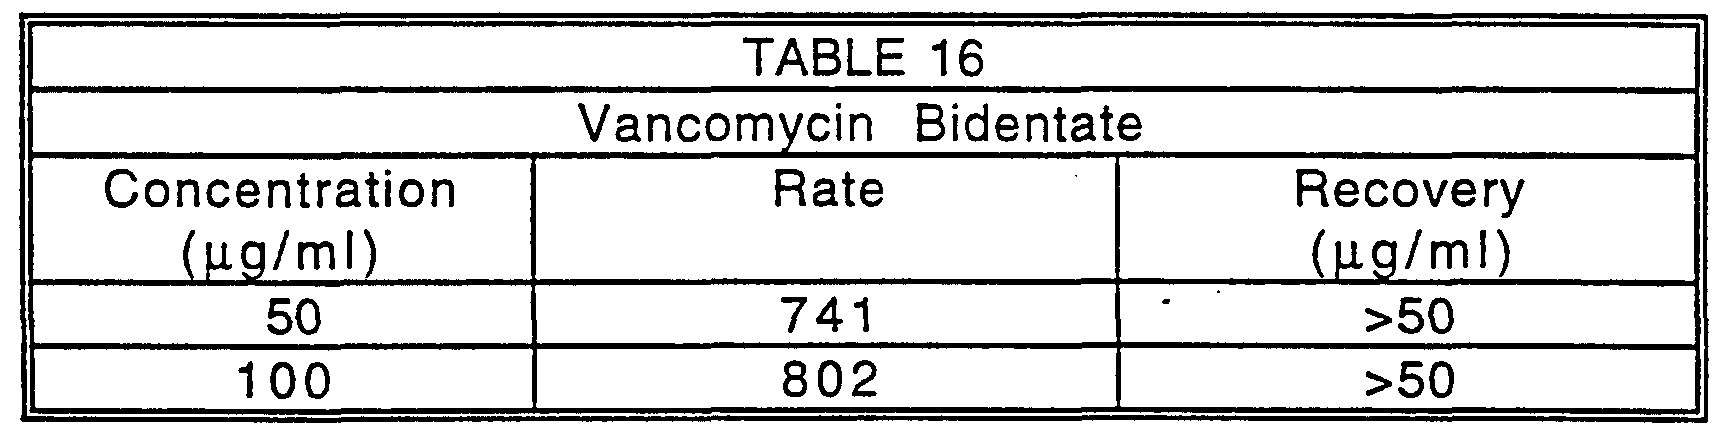 emit assay vancomycin New modified fluorescence polarization immunoassay does not falsely  (emit) serum vancomycin samples were  the modified fpia assay is a satisfactory.